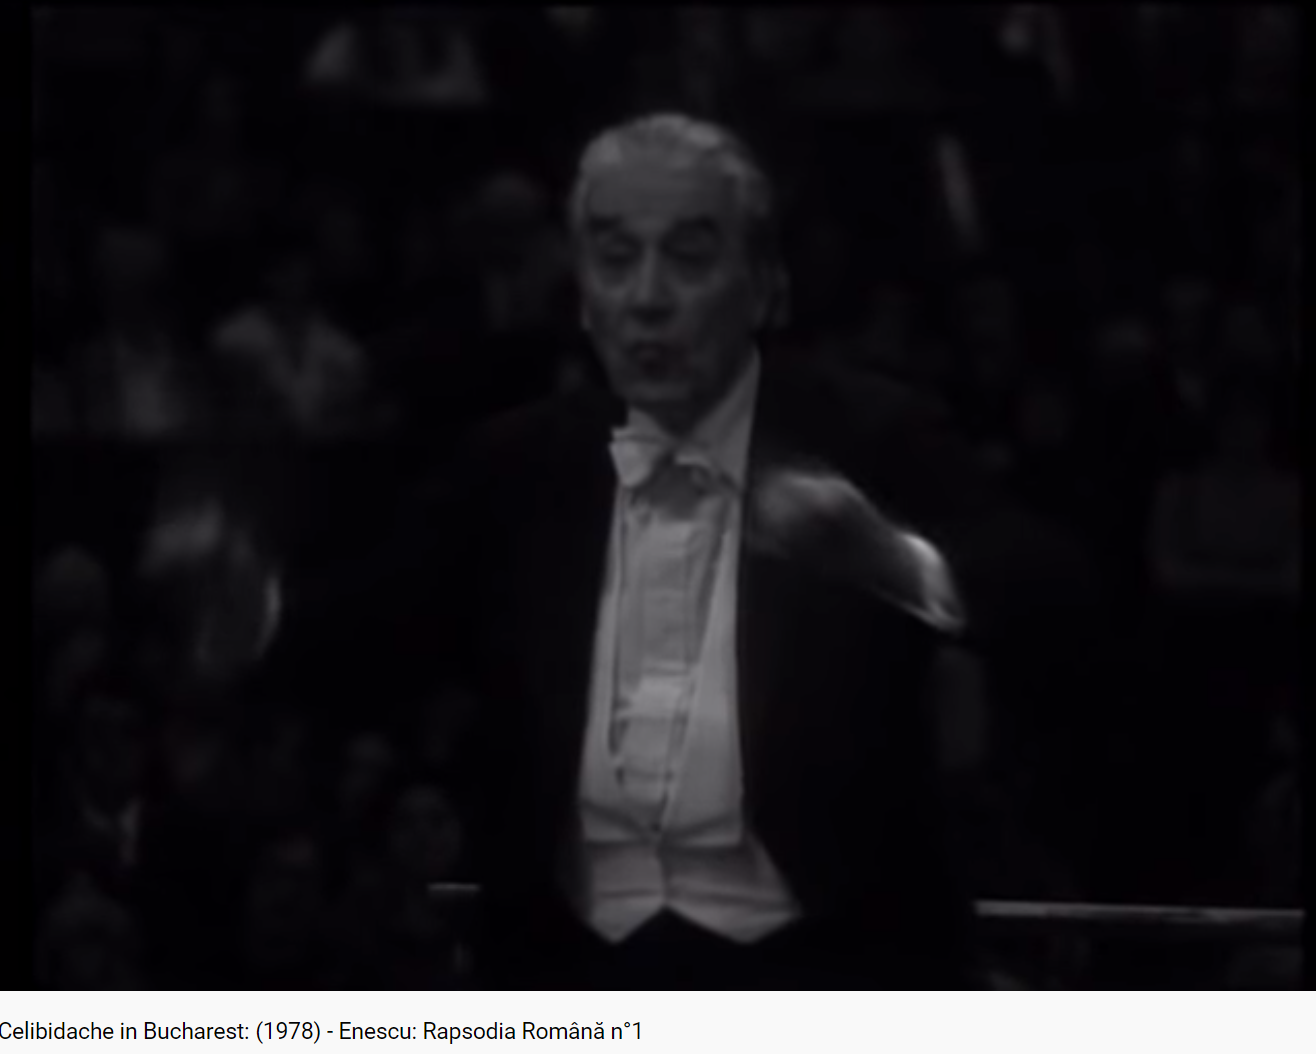 Enesco (Enescu) rhapsodie roumaine